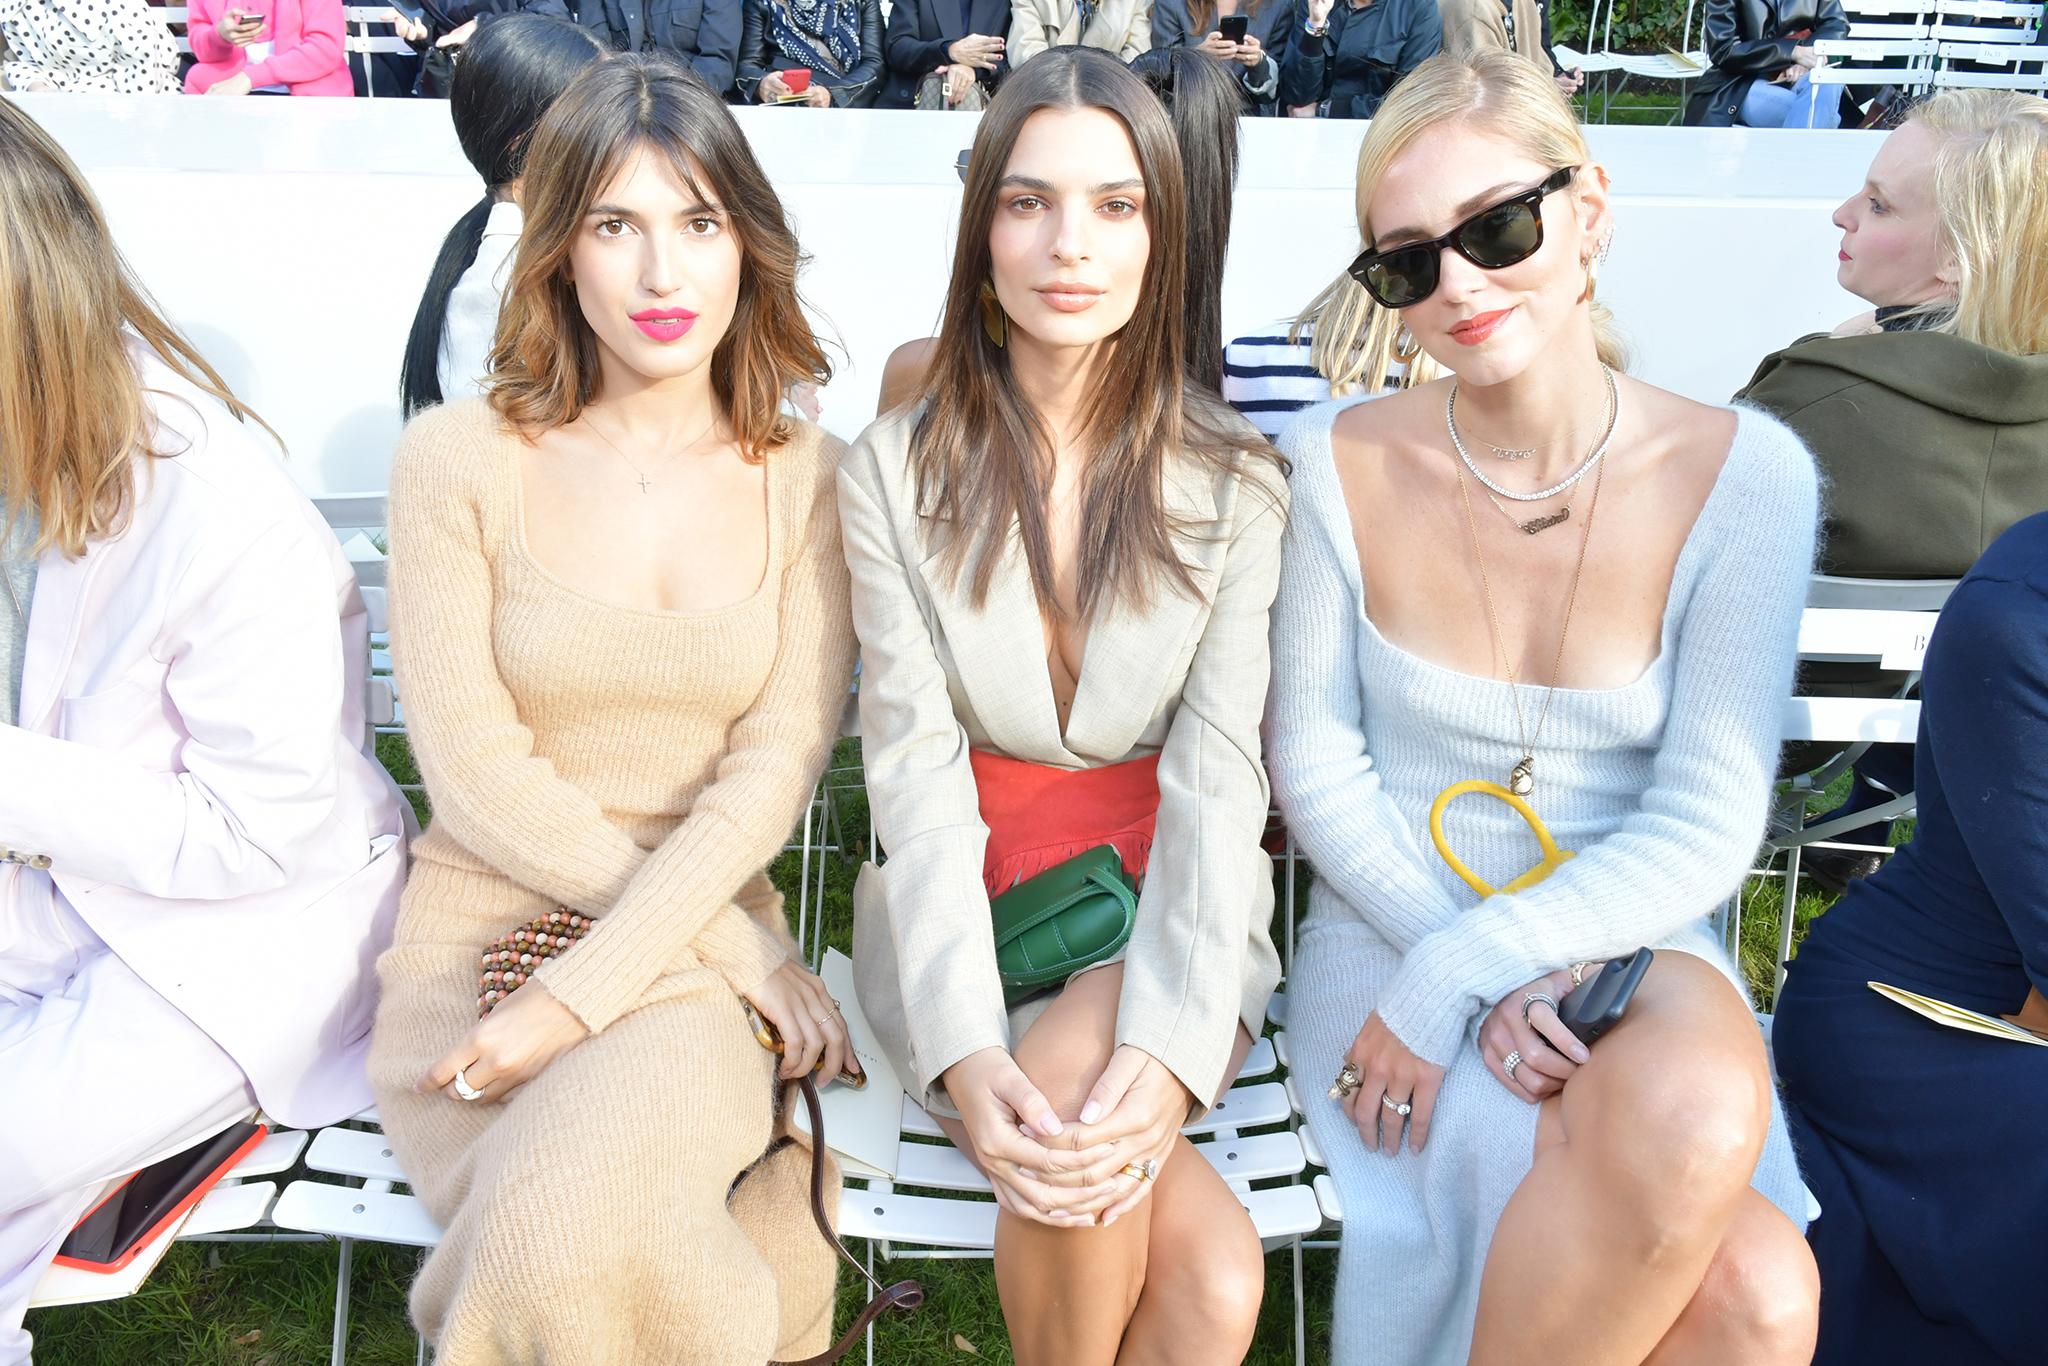 Jeanne Damas, Emily Ratajkowski and Chiara Ferragni